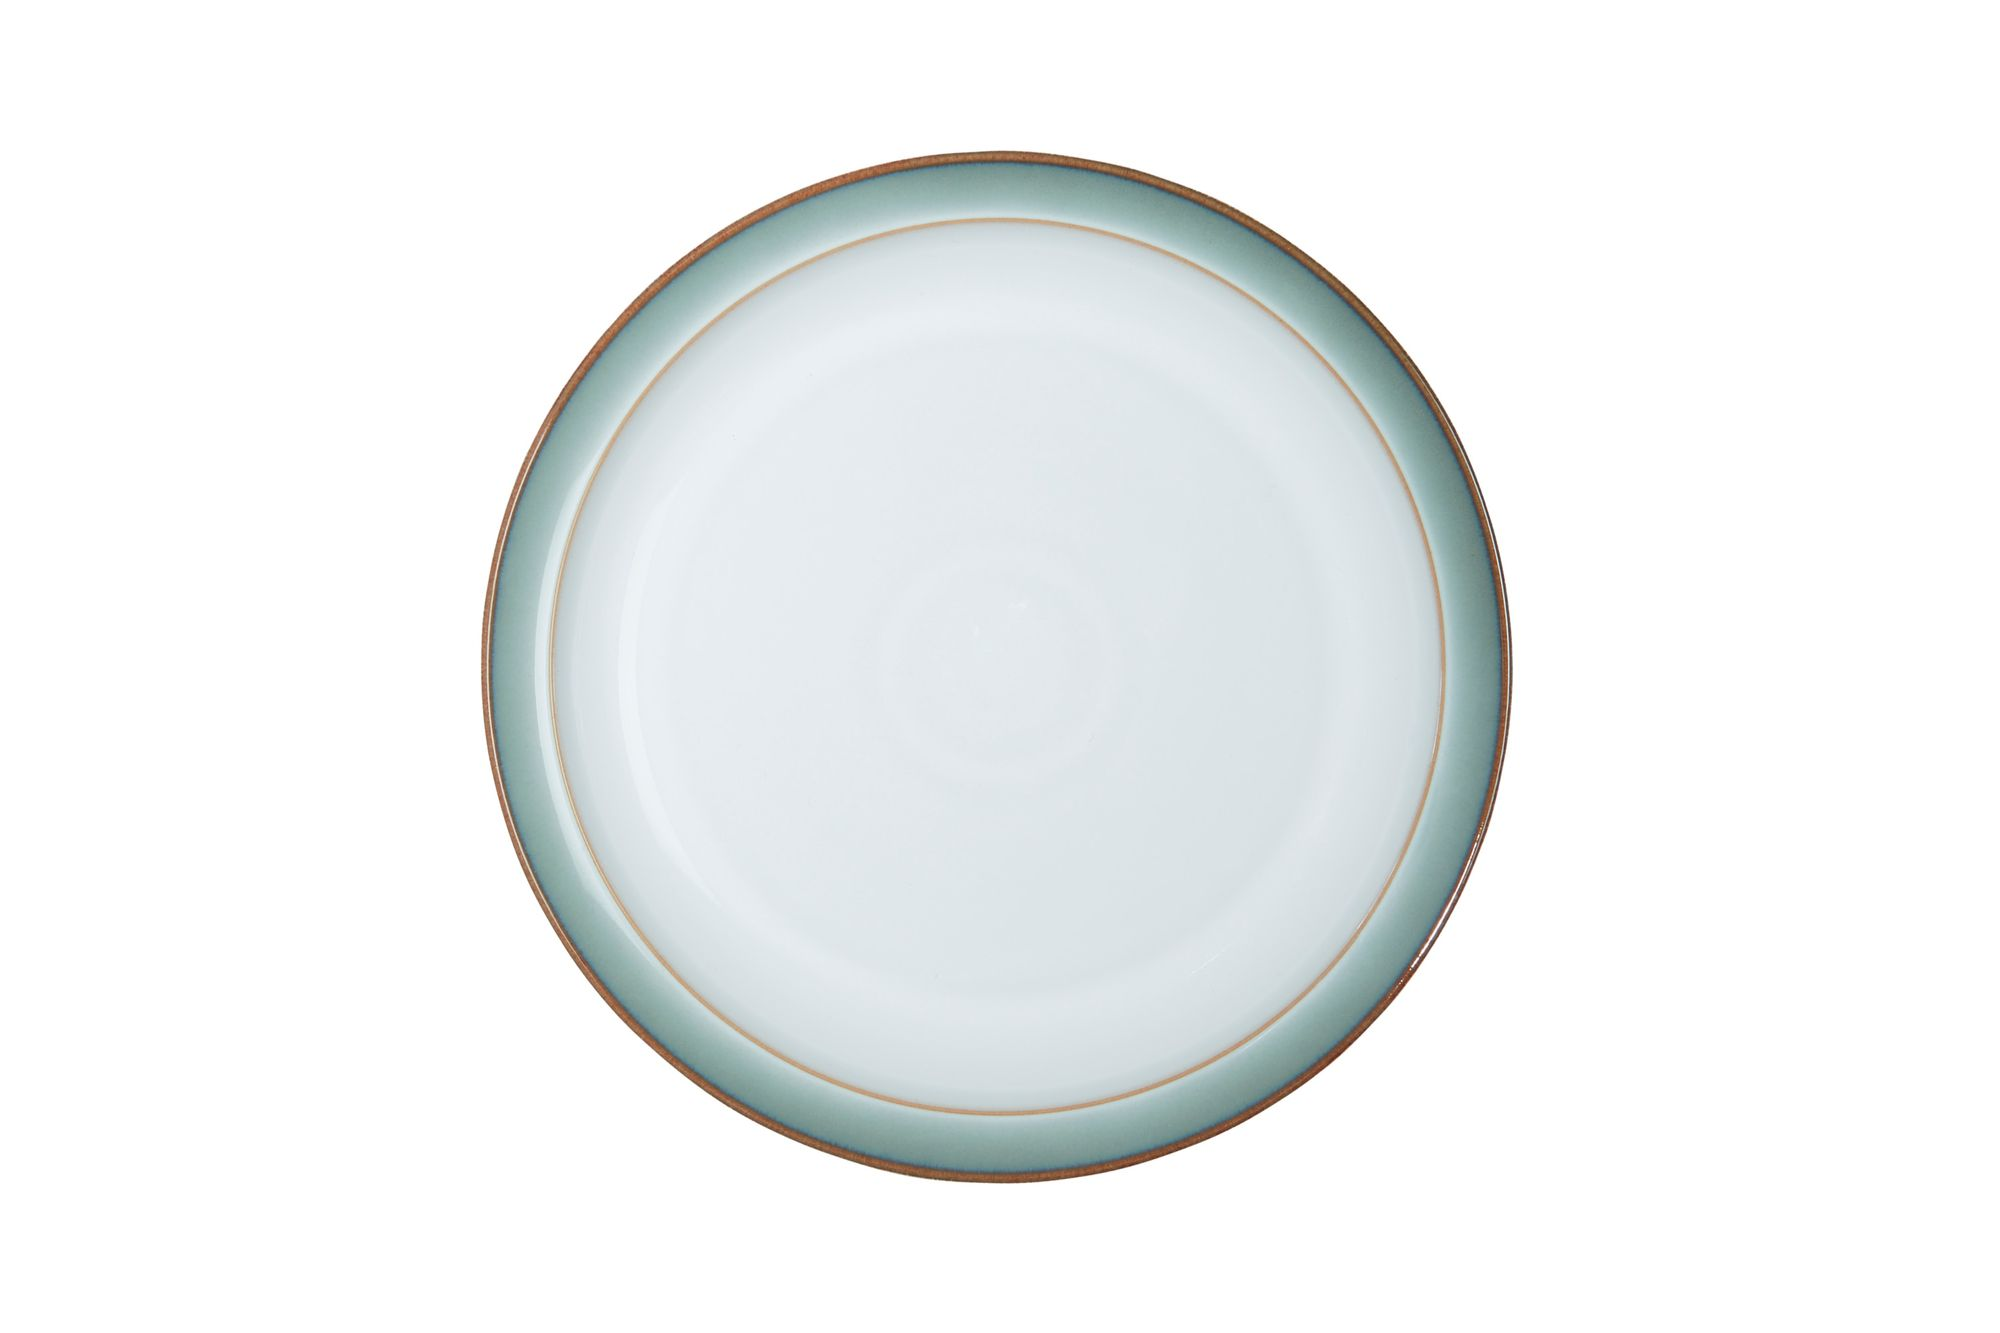 Denby Regency Green Side Plate Deep Plate 21.5 x 3cm thumb 2